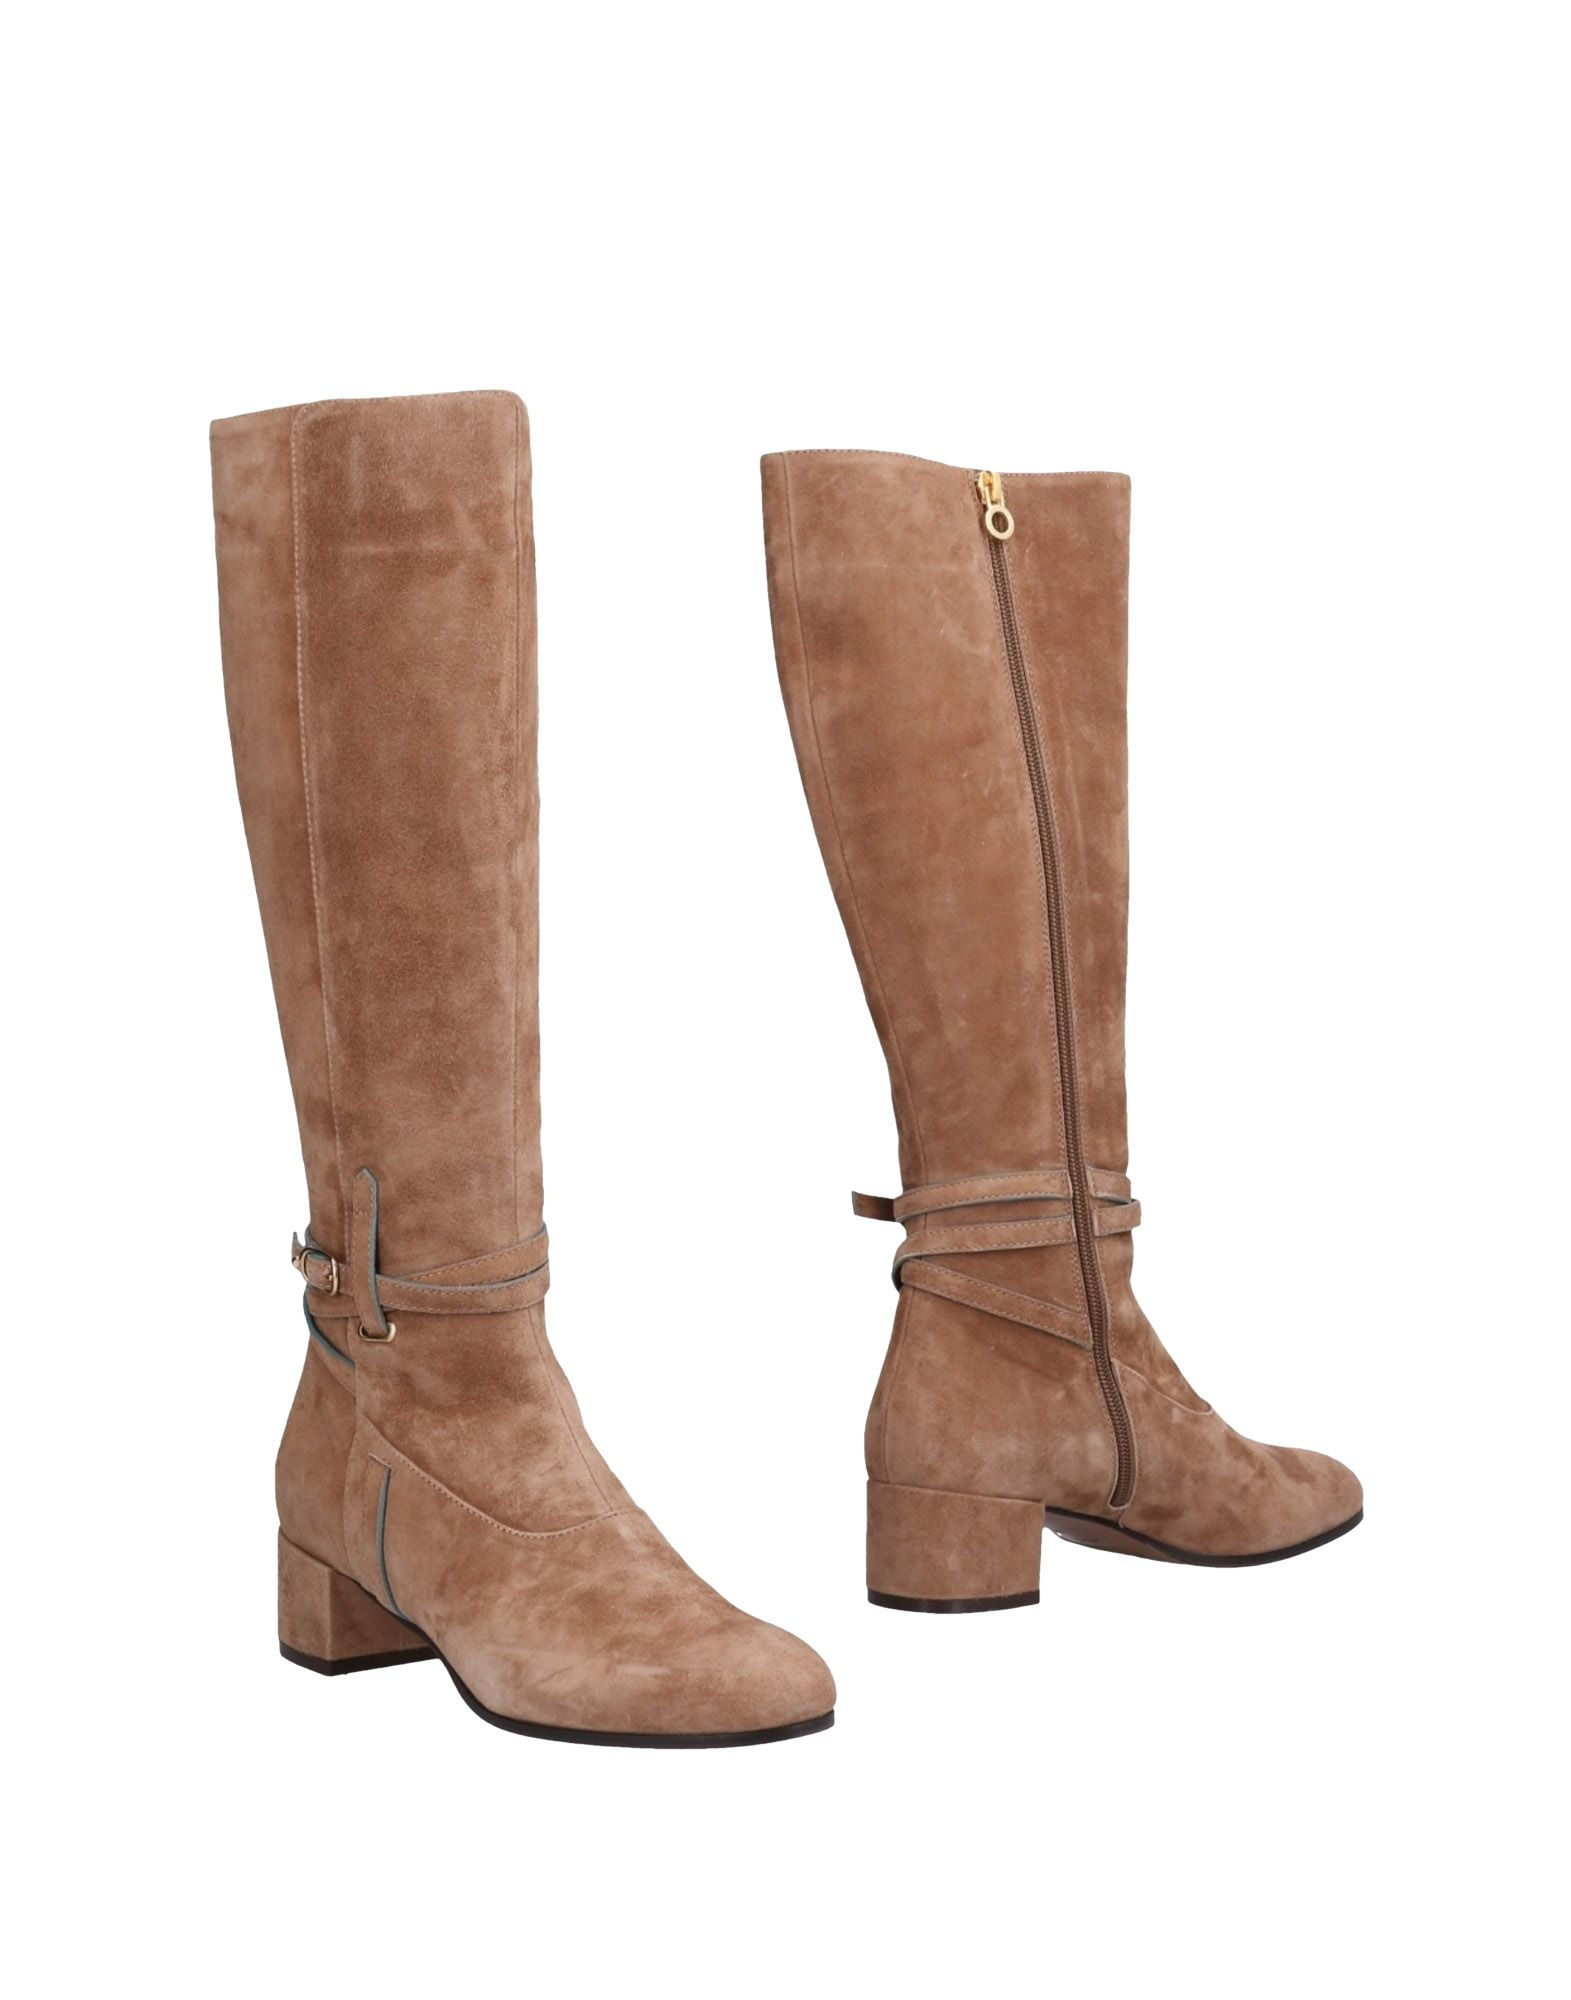 L' Autre Chose Stiefel Damen Schuhe  11488620TFGünstige gut aussehende Schuhe Damen e2207b